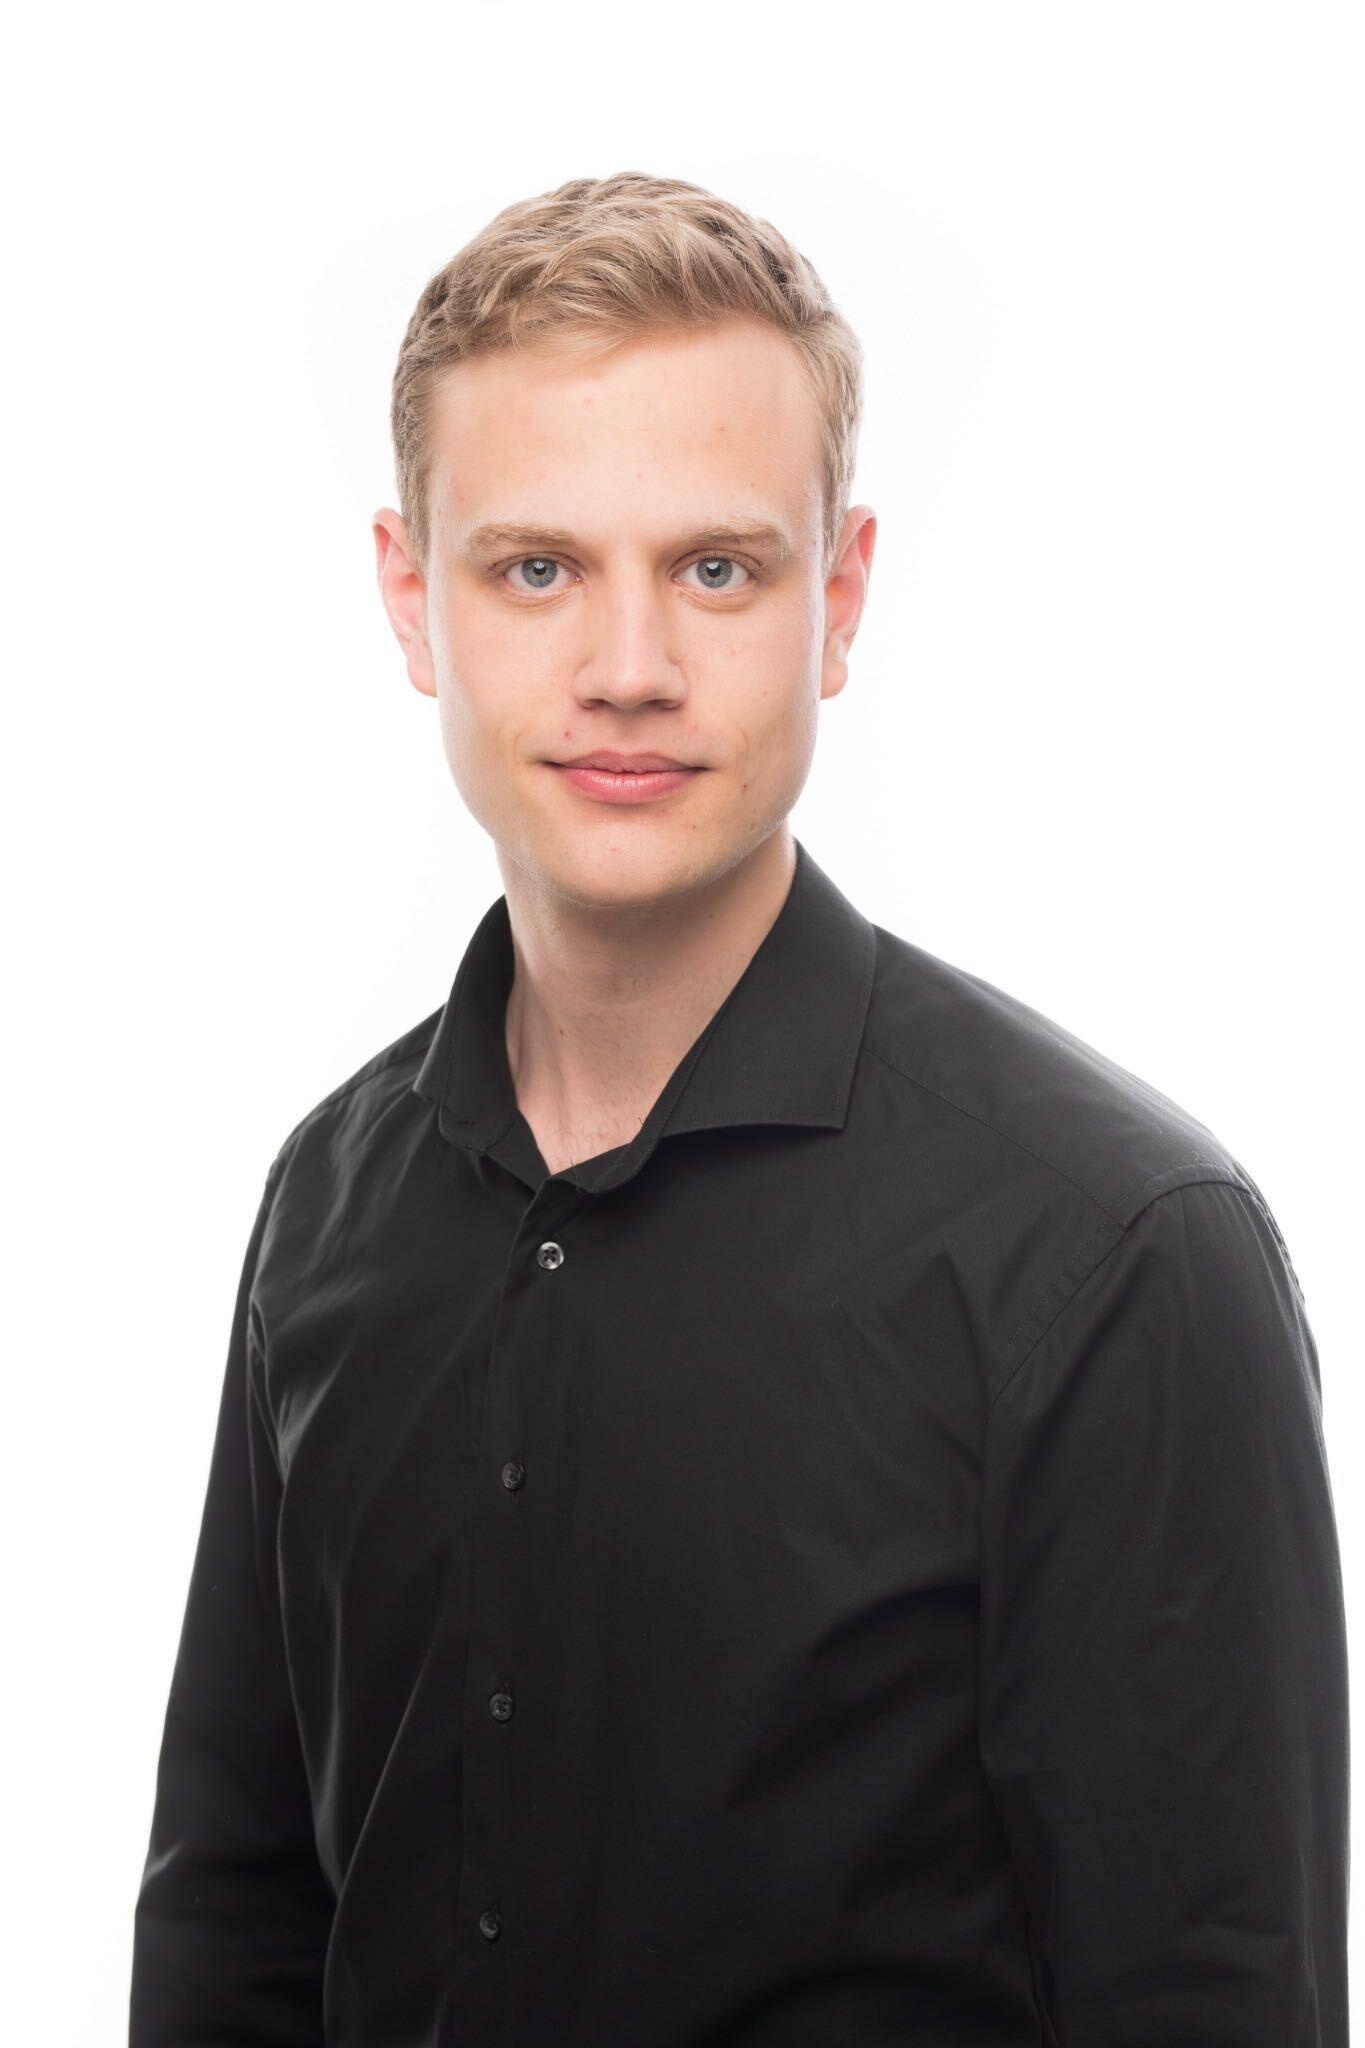 Oliver Knöpfli